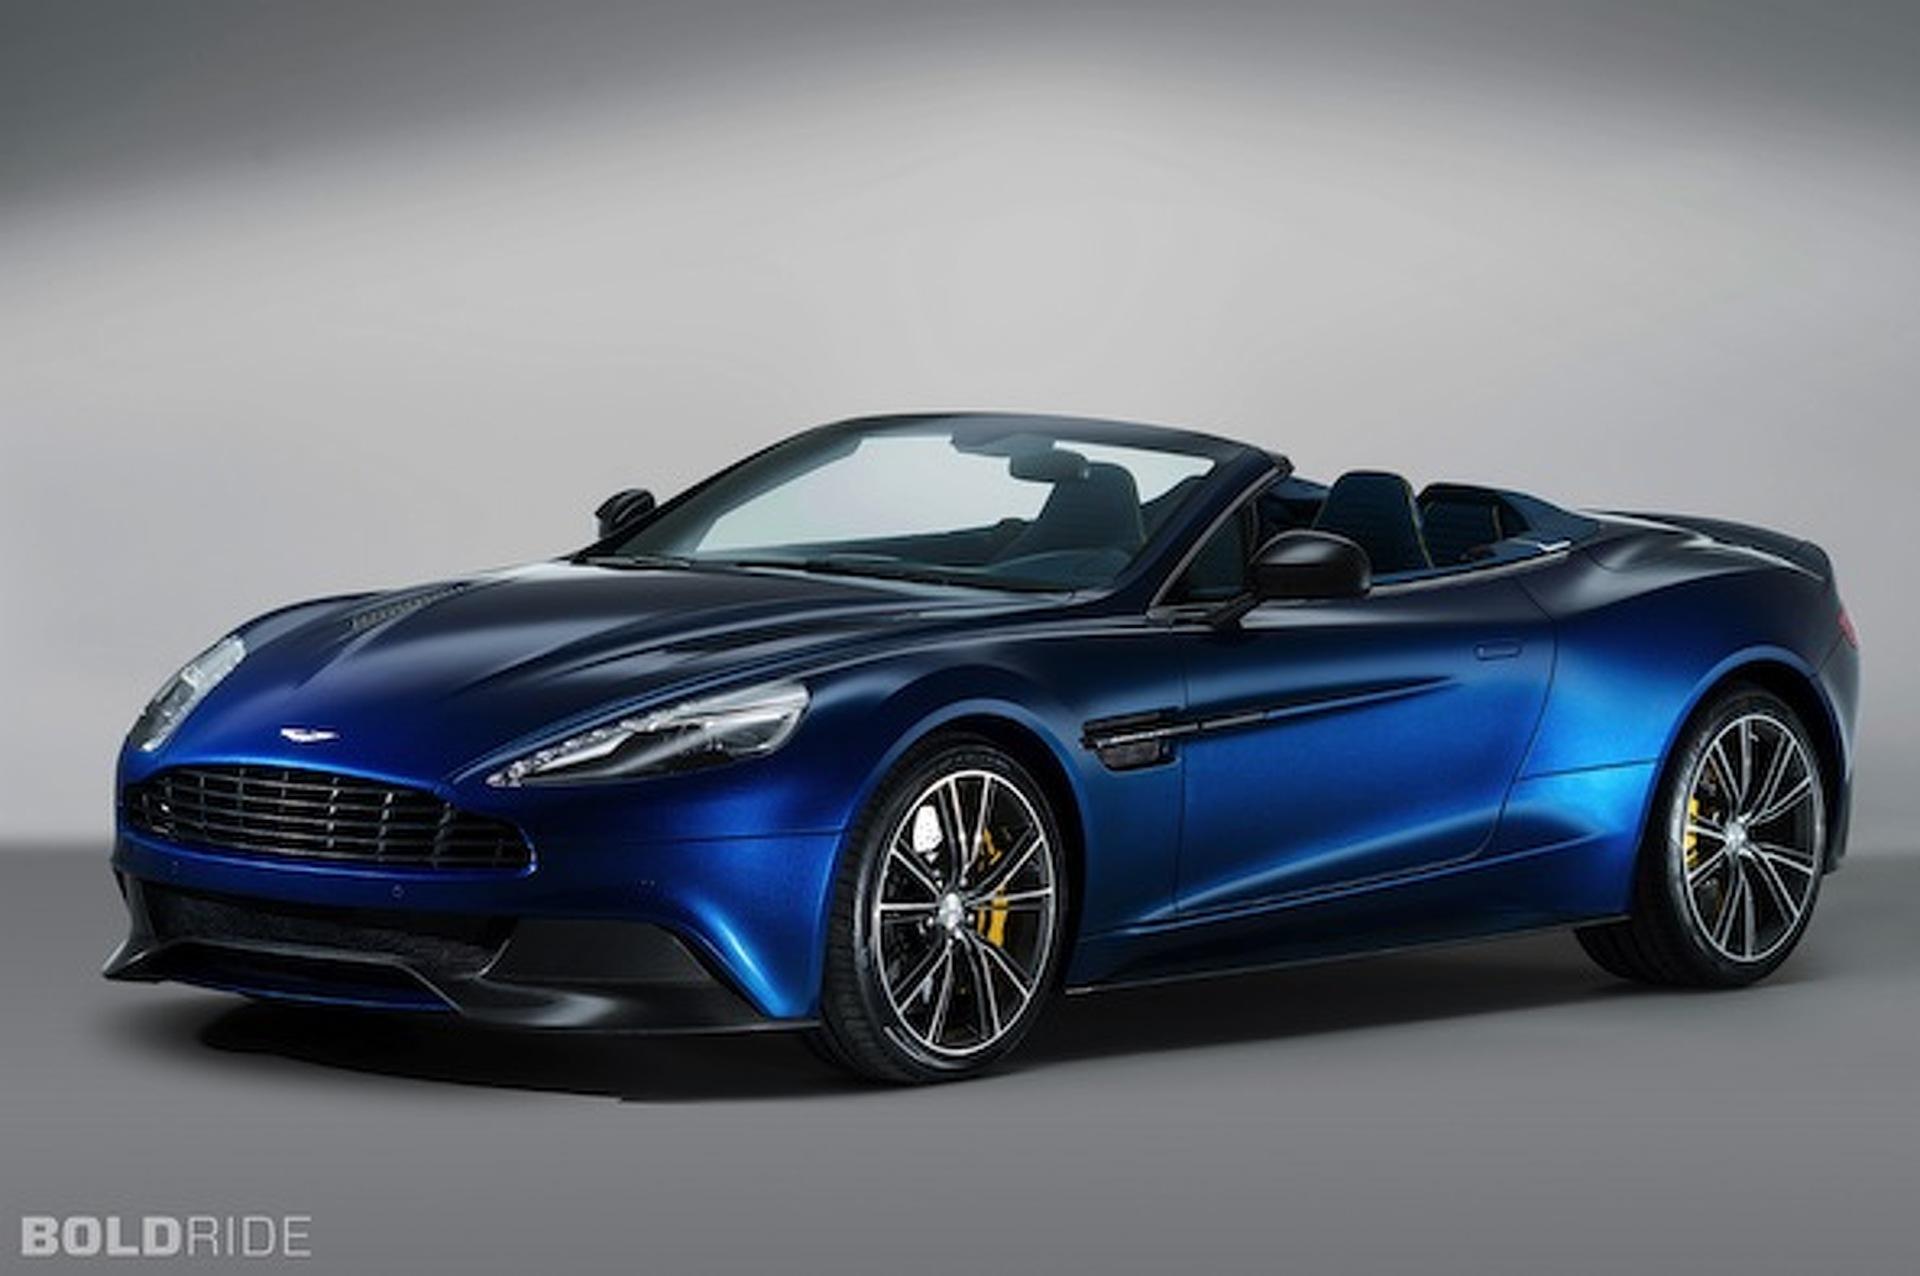 Aston Martin Vanquish Volante Drops its Top for $300K